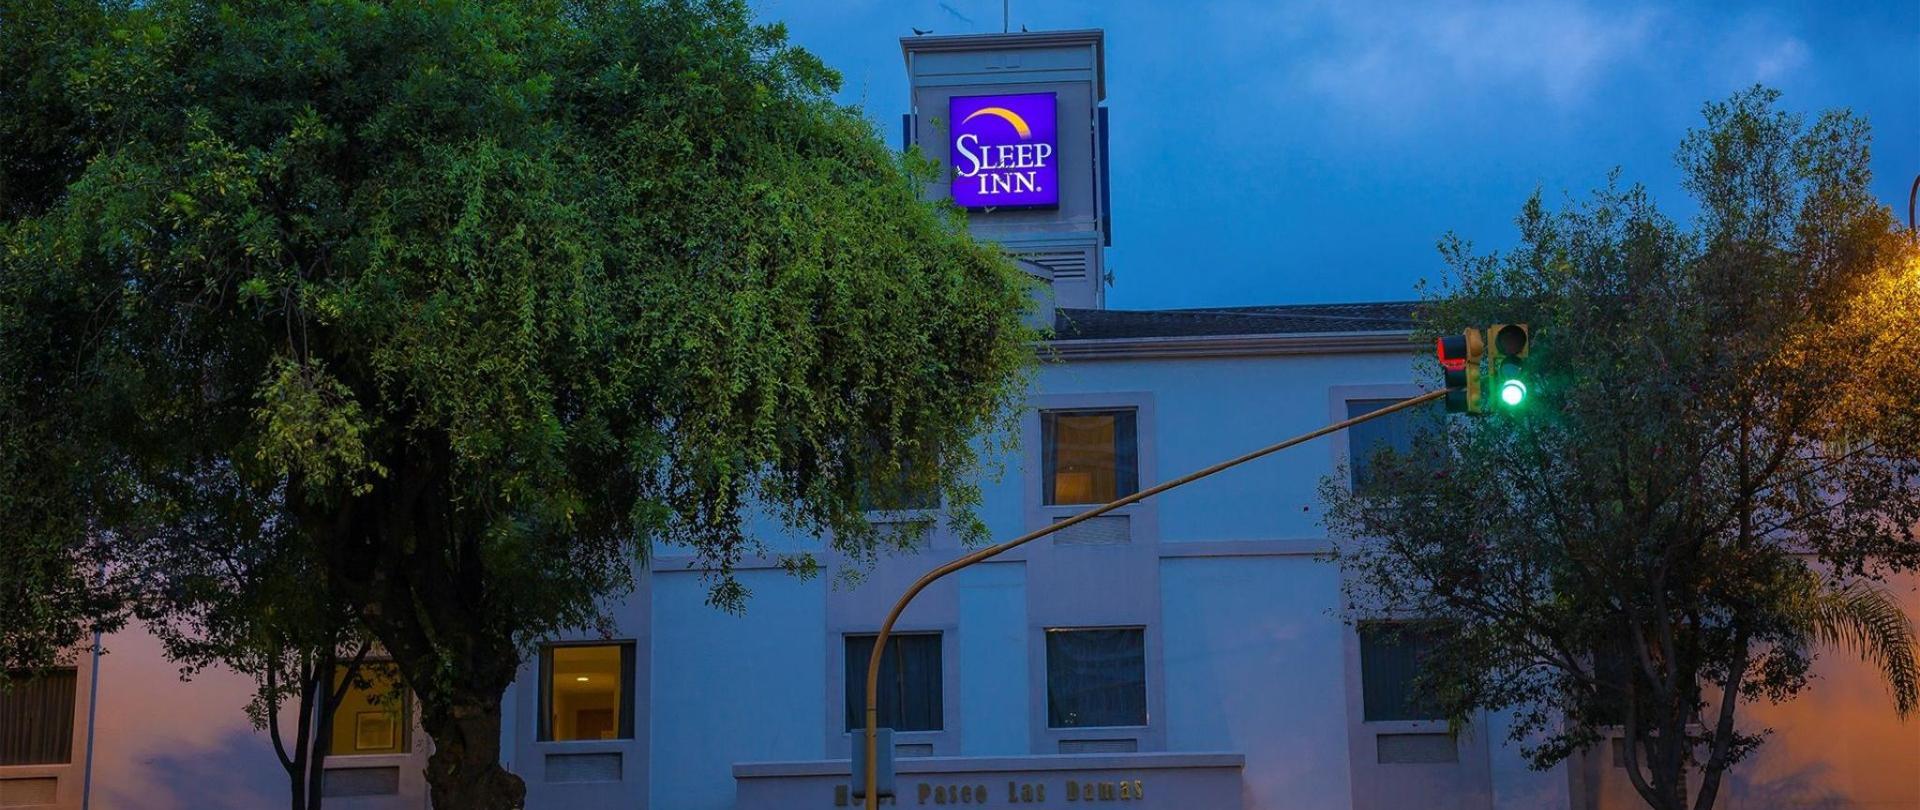 Hotel Sleep Inn Paseo Las Damas.jpg